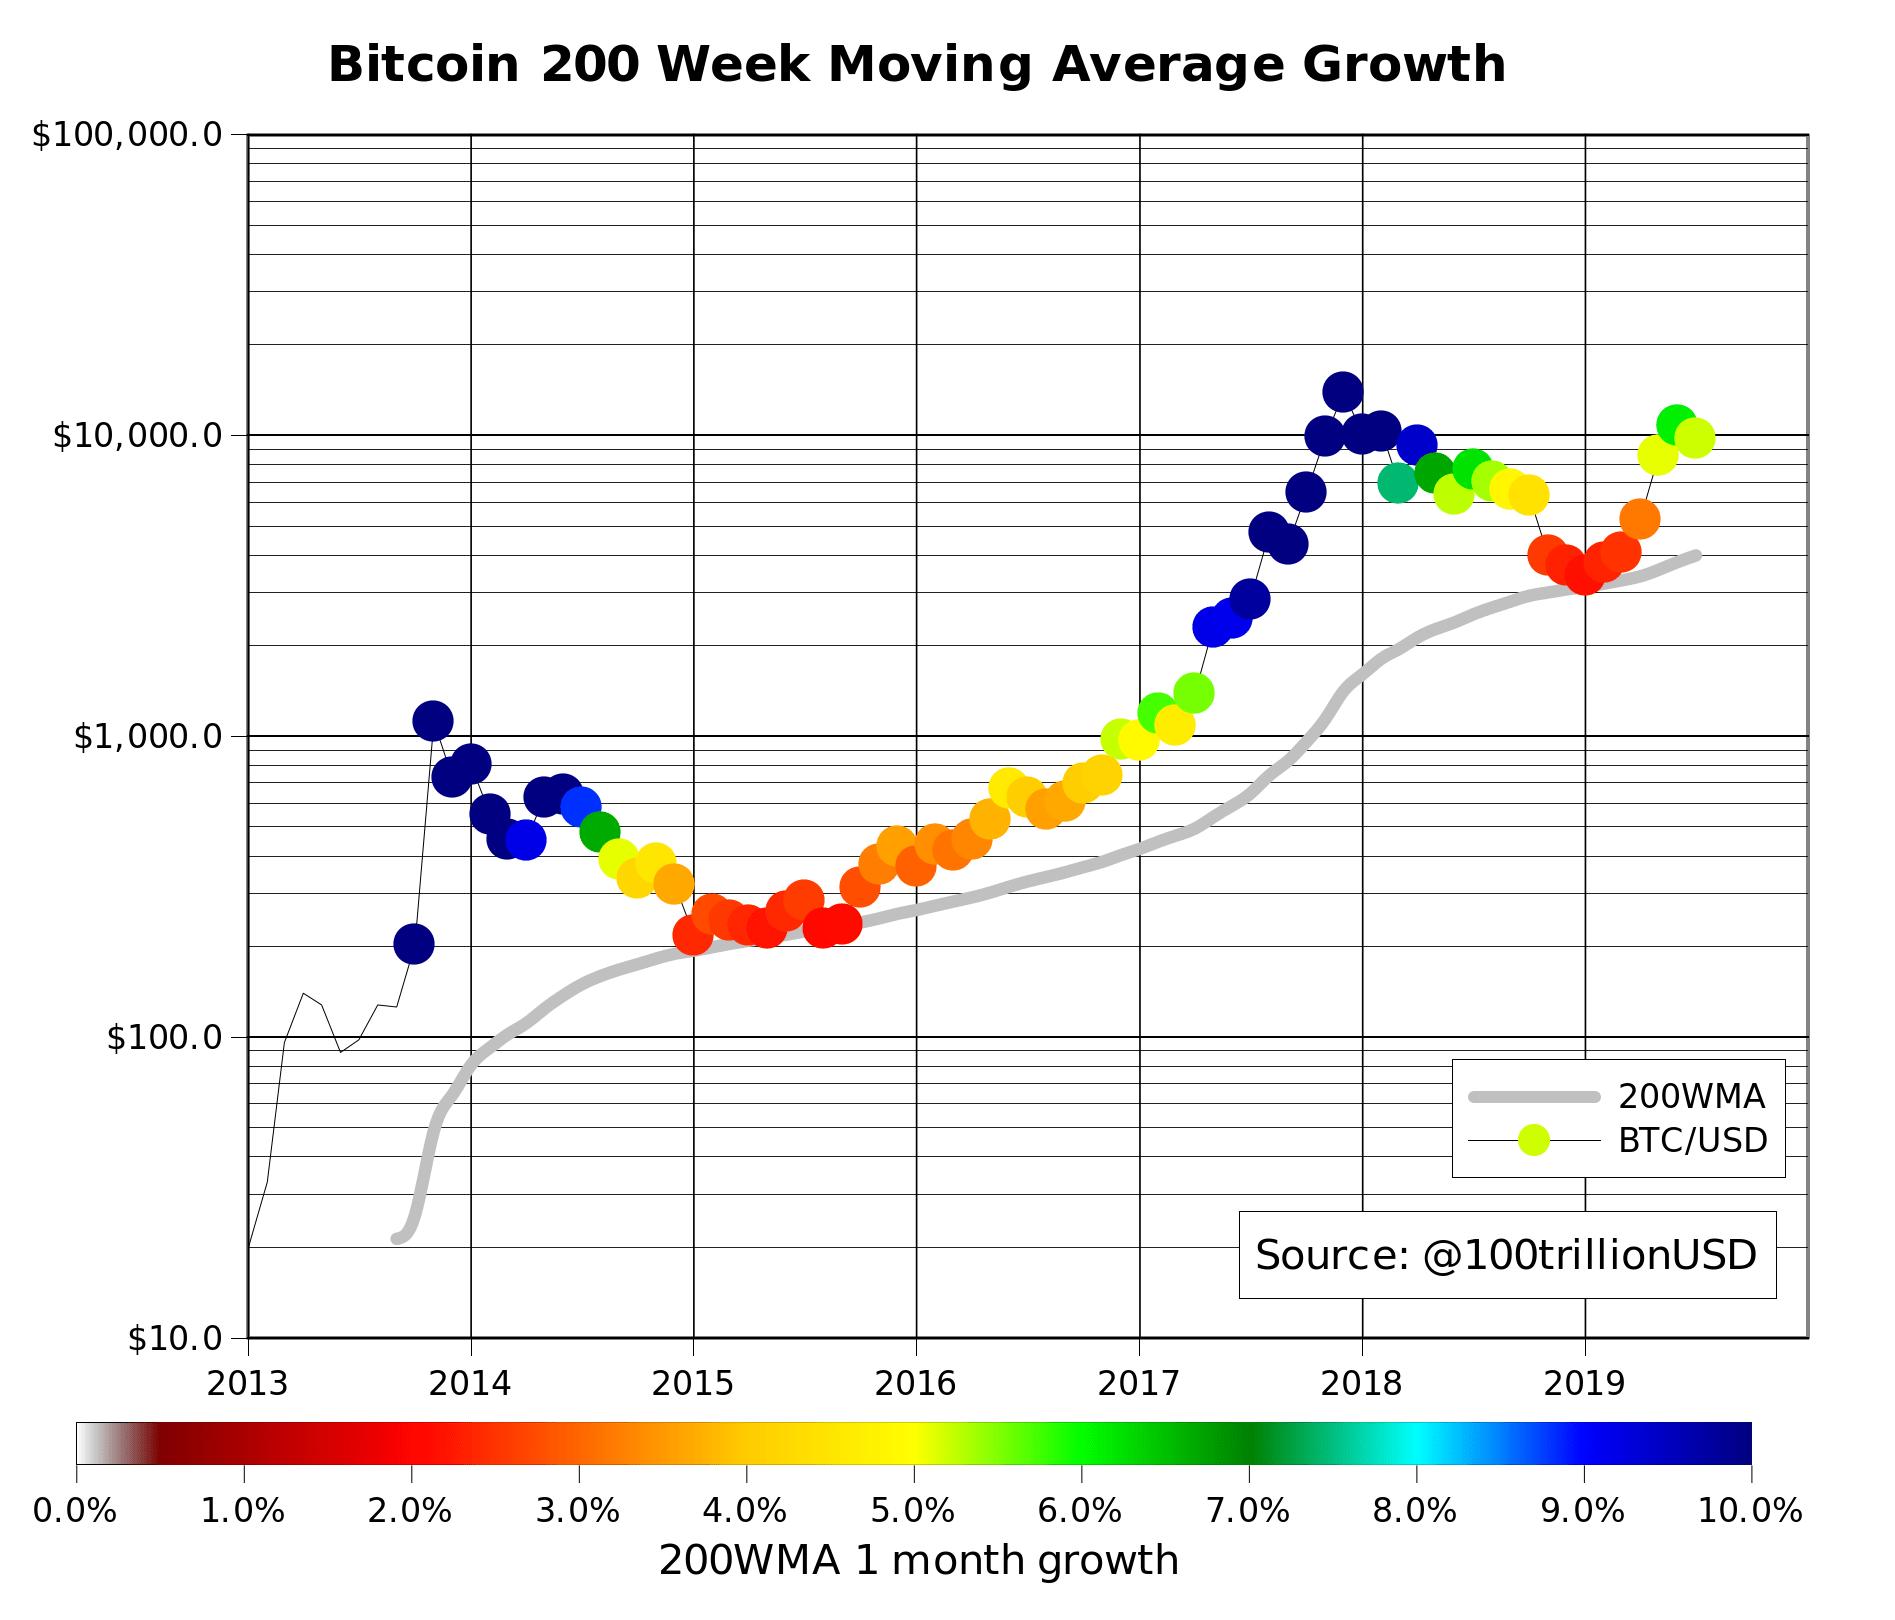 En este momento estás viendo Media movil de 200 semanas de Bitcoin